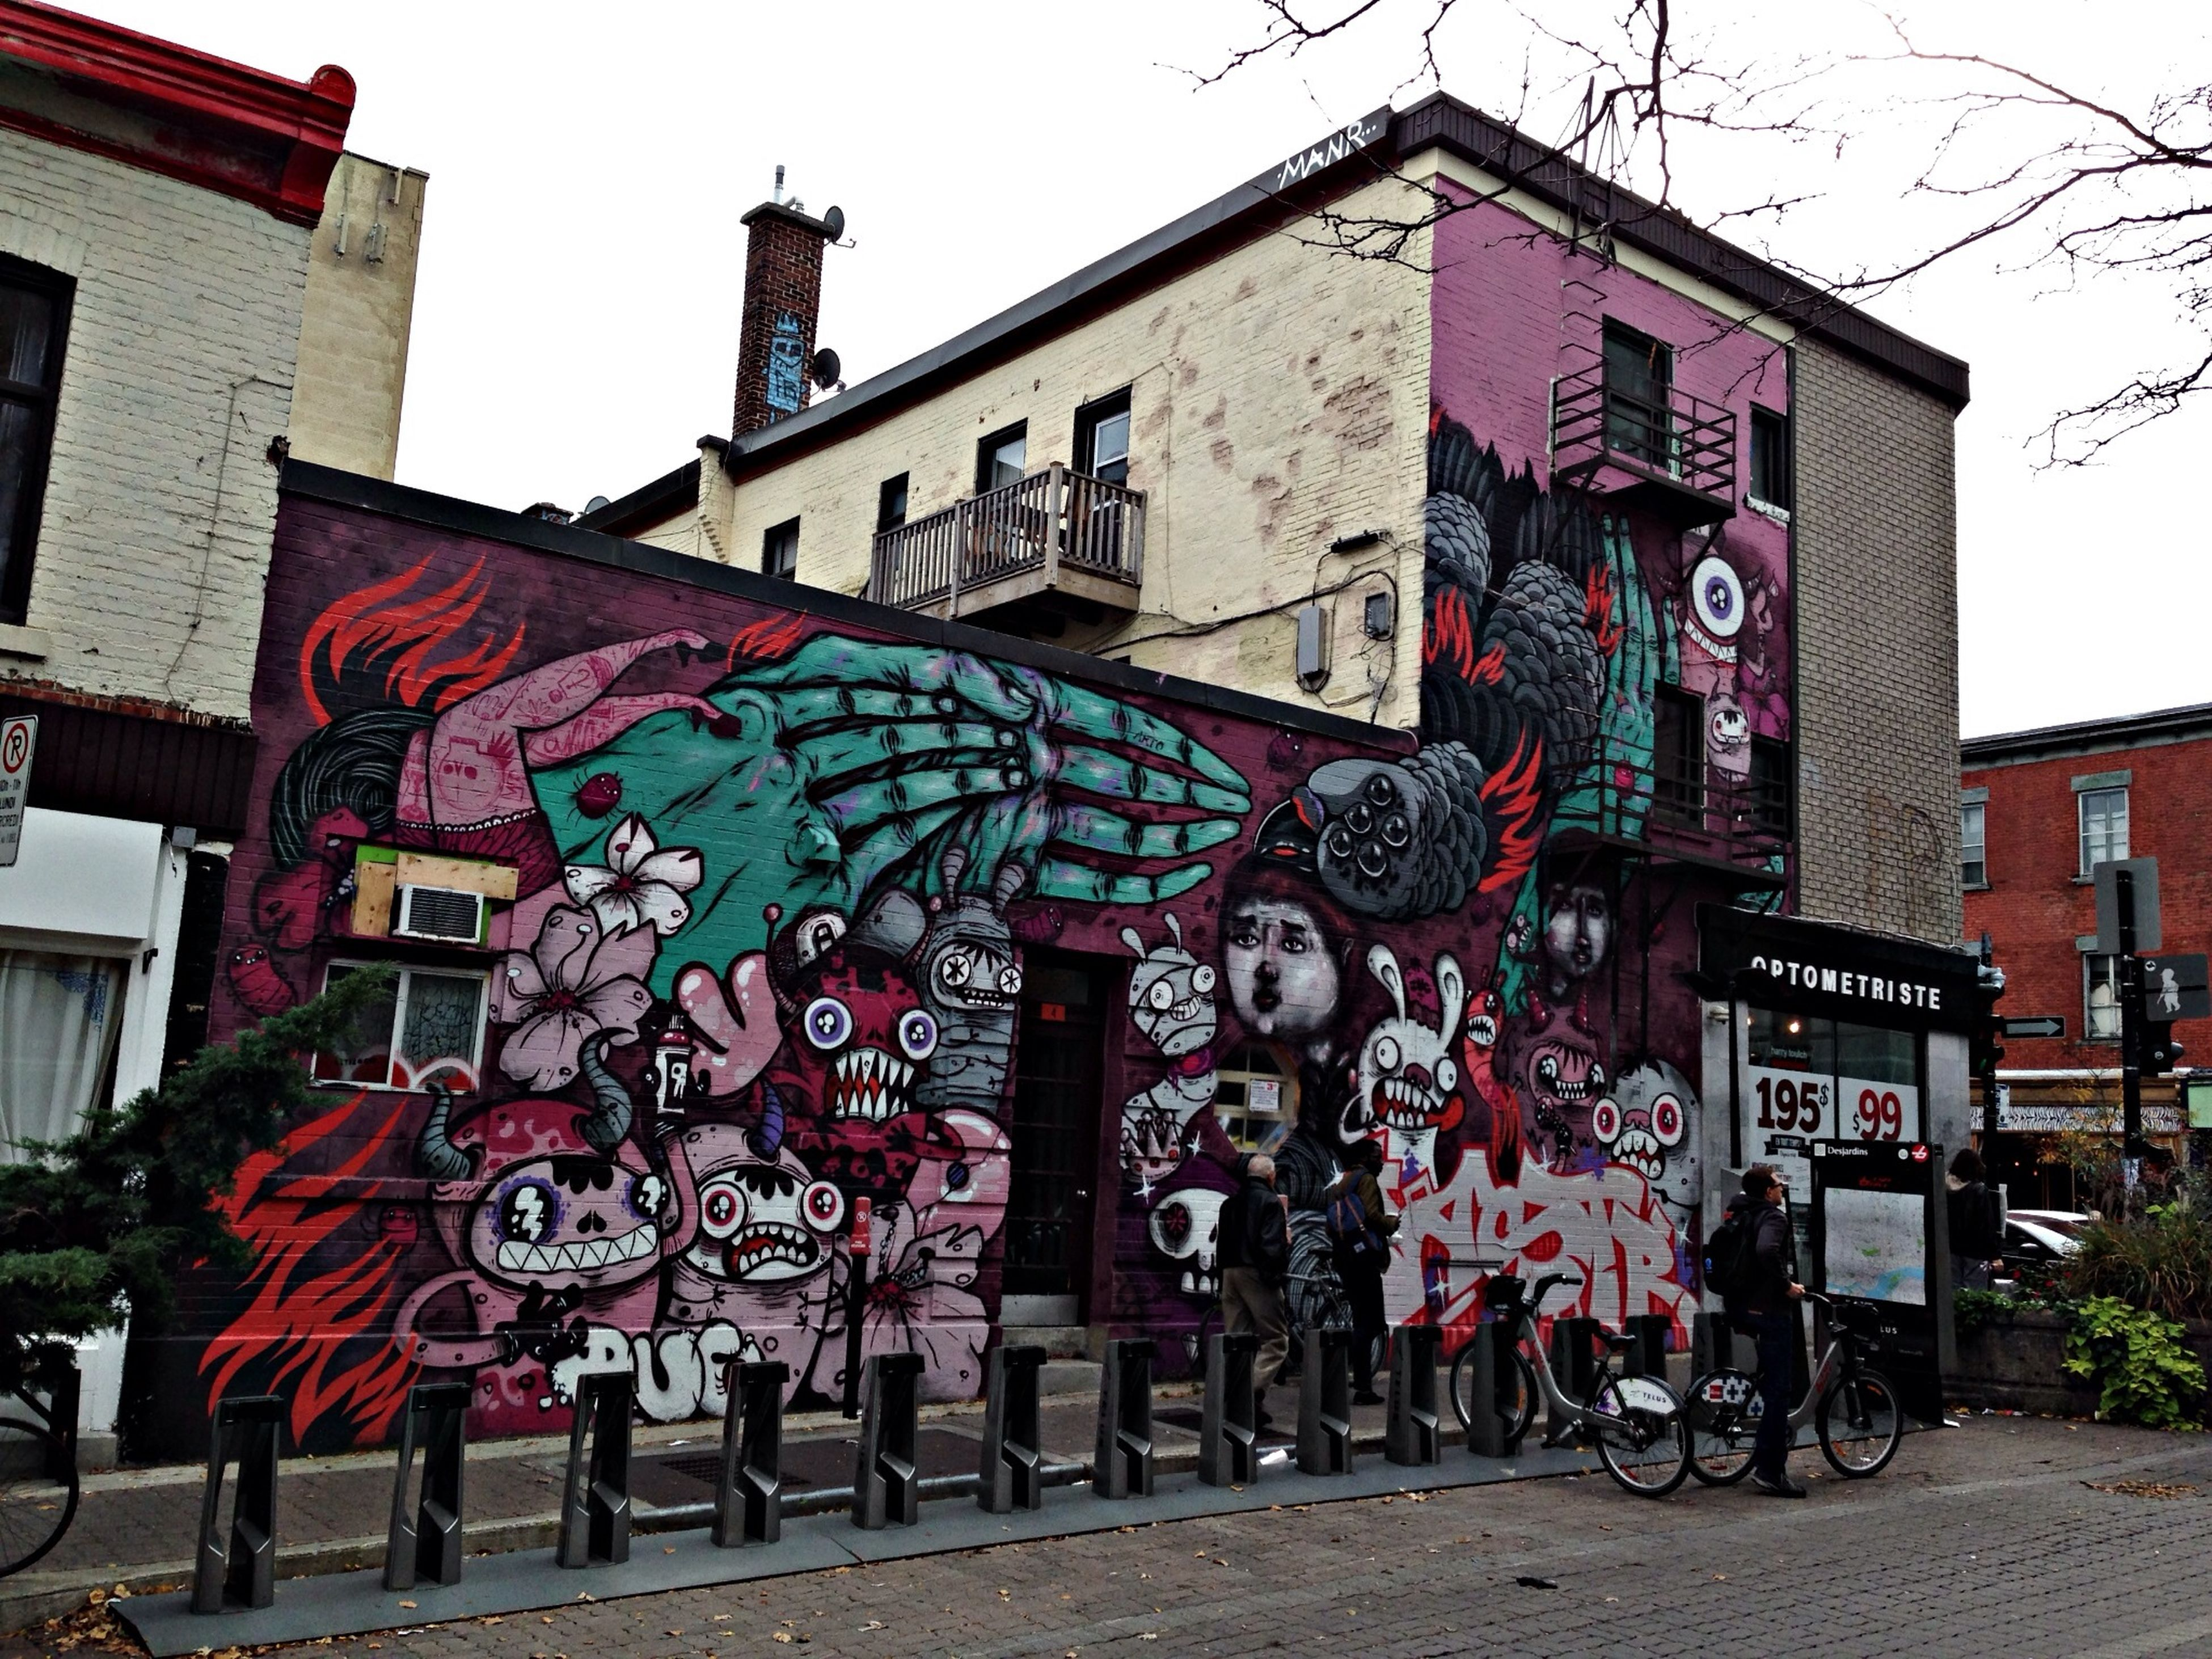 Graffiti Astro see Trashbonbon.ca